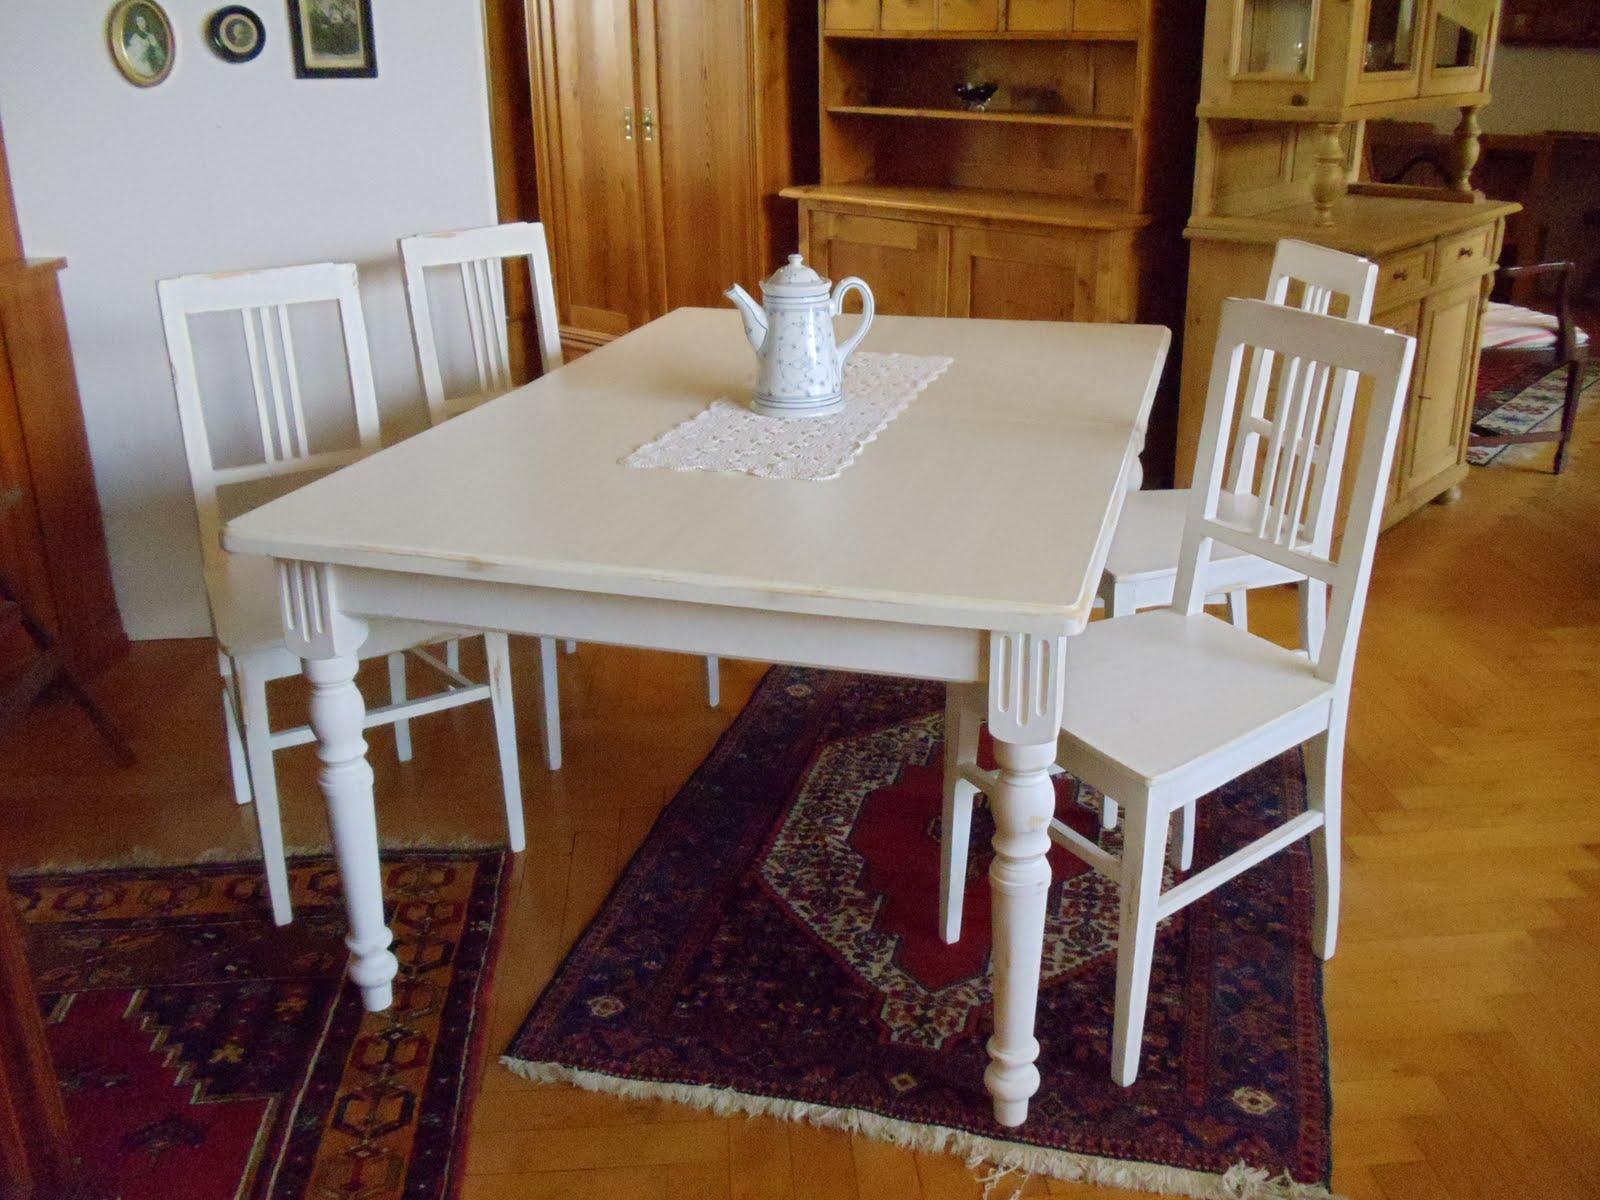 antike m bel sitzgruppe wei im landhausstil. Black Bedroom Furniture Sets. Home Design Ideas